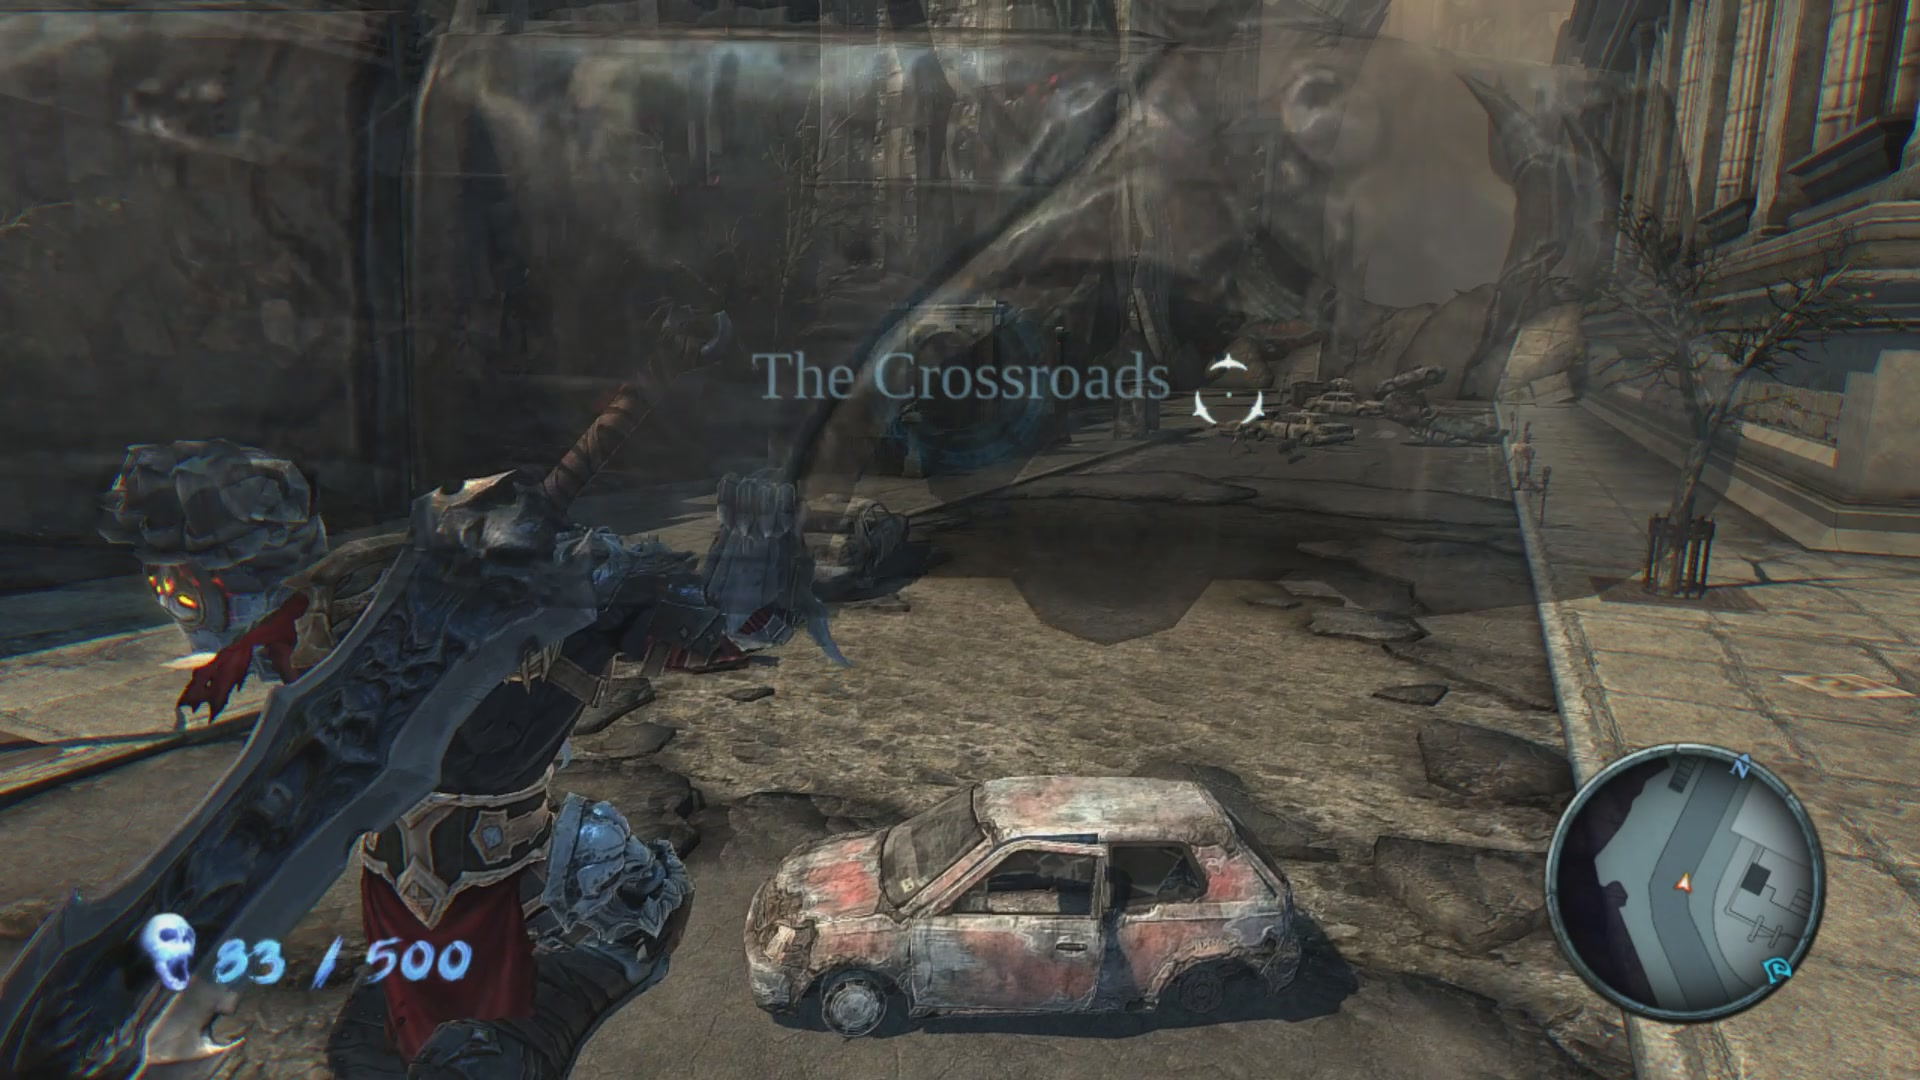 Crossroads & Darksiders/any% - SDA Knowledge Base